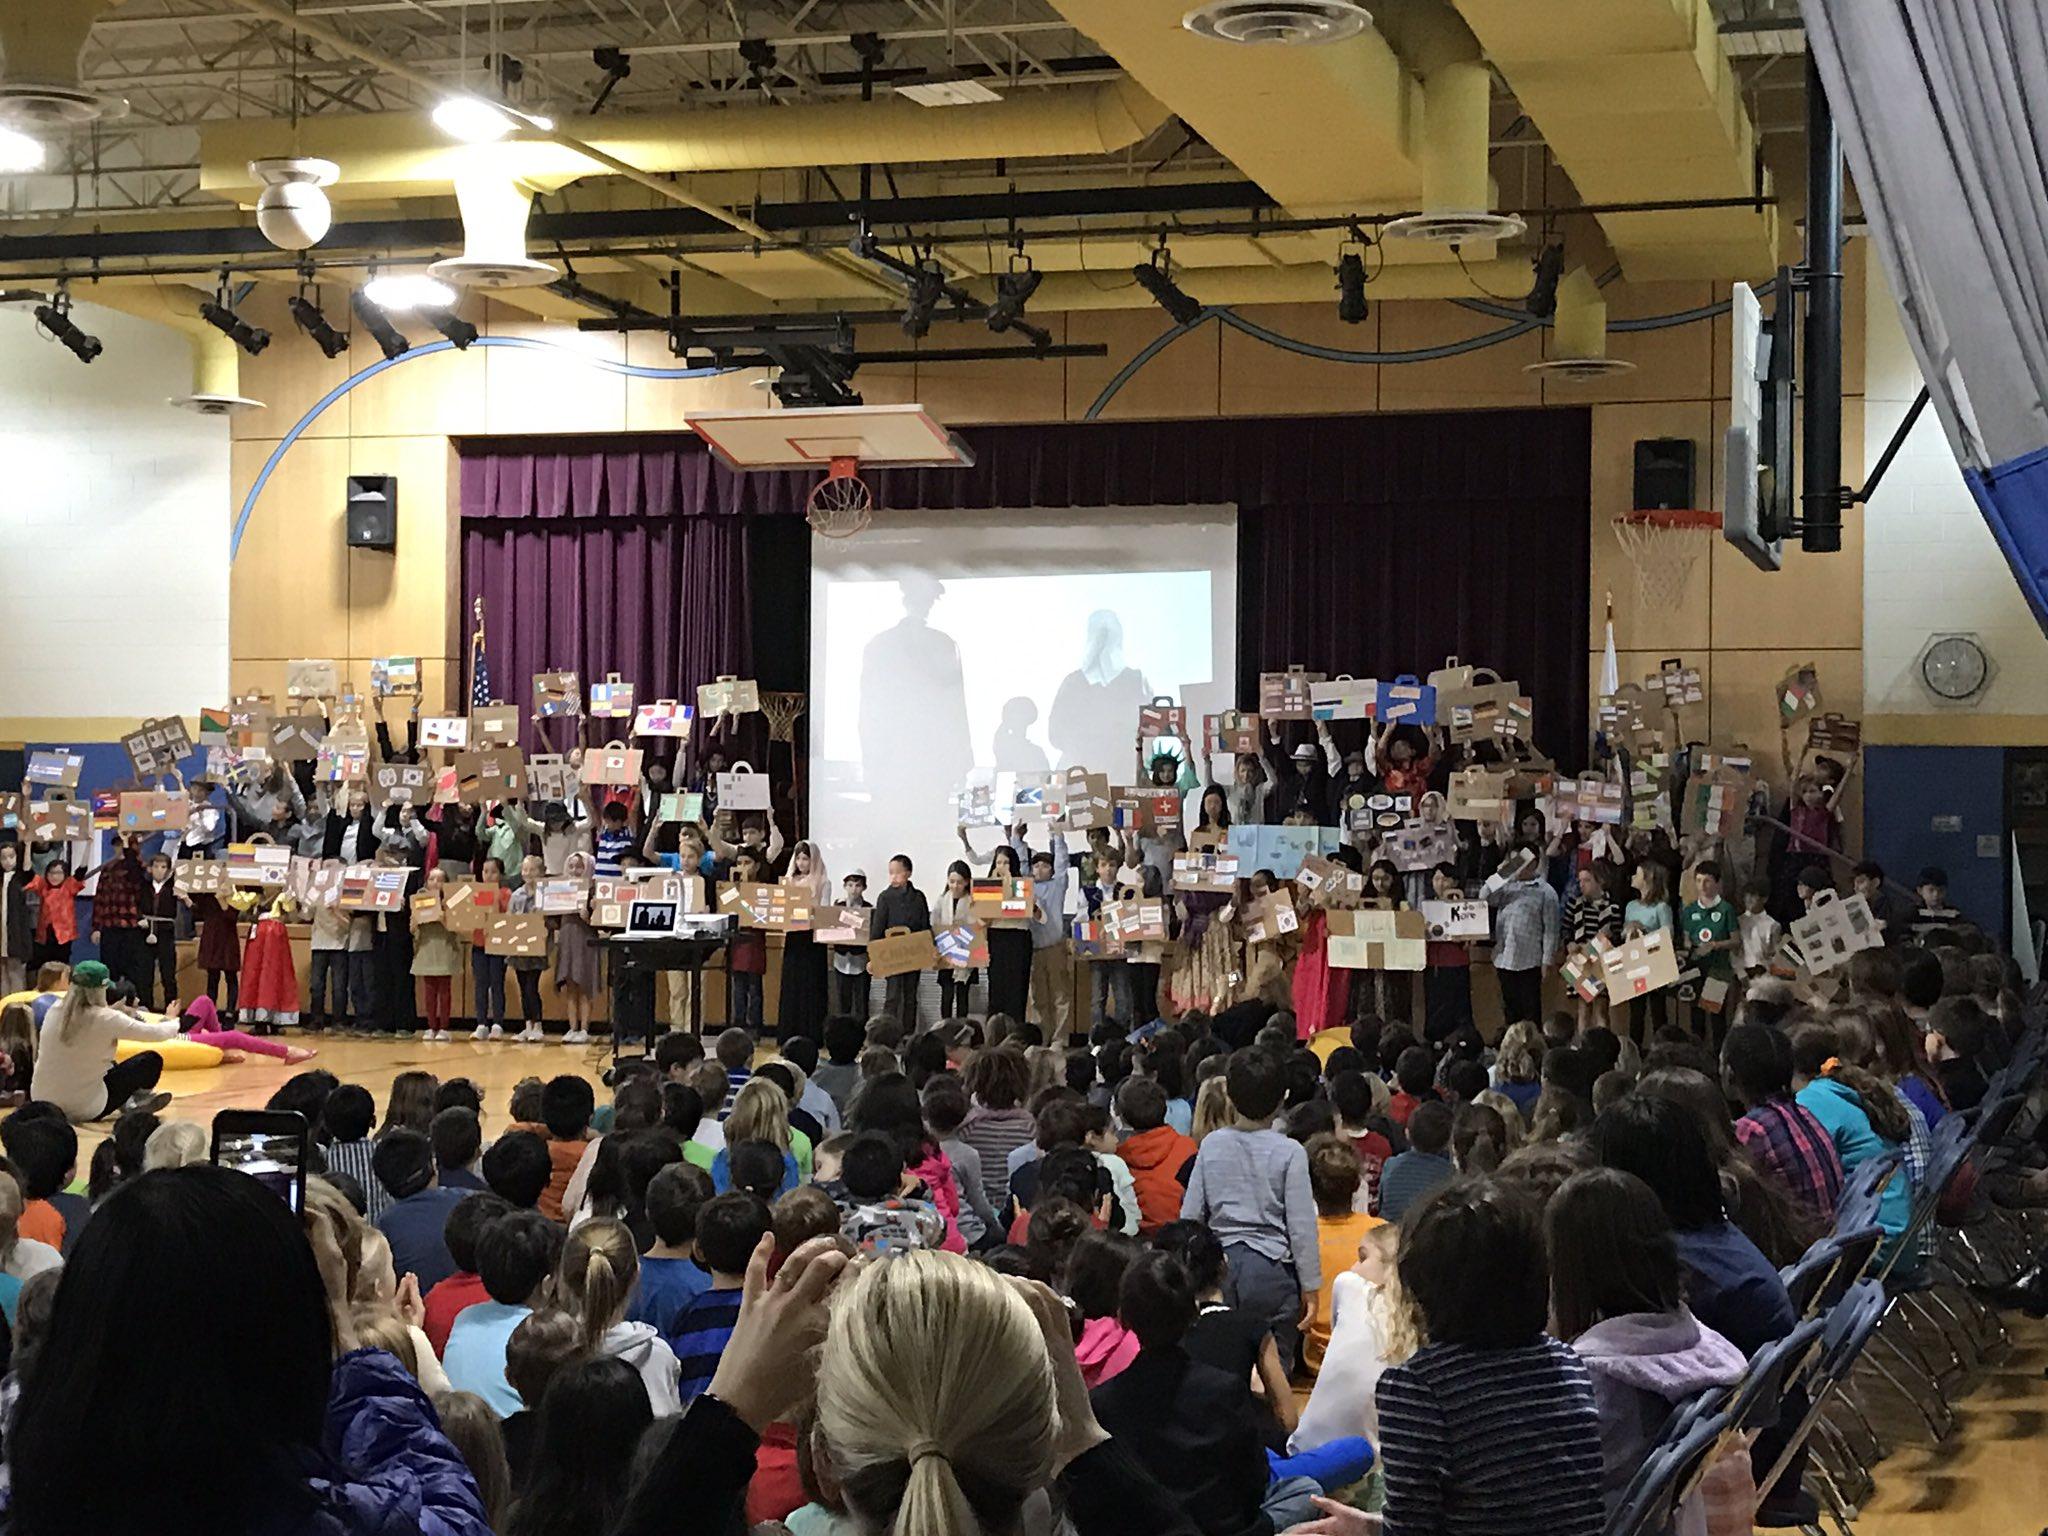 Amazing 4th grade presentation on immigration! #fiskeschool https://t.co/roAXvWctbV